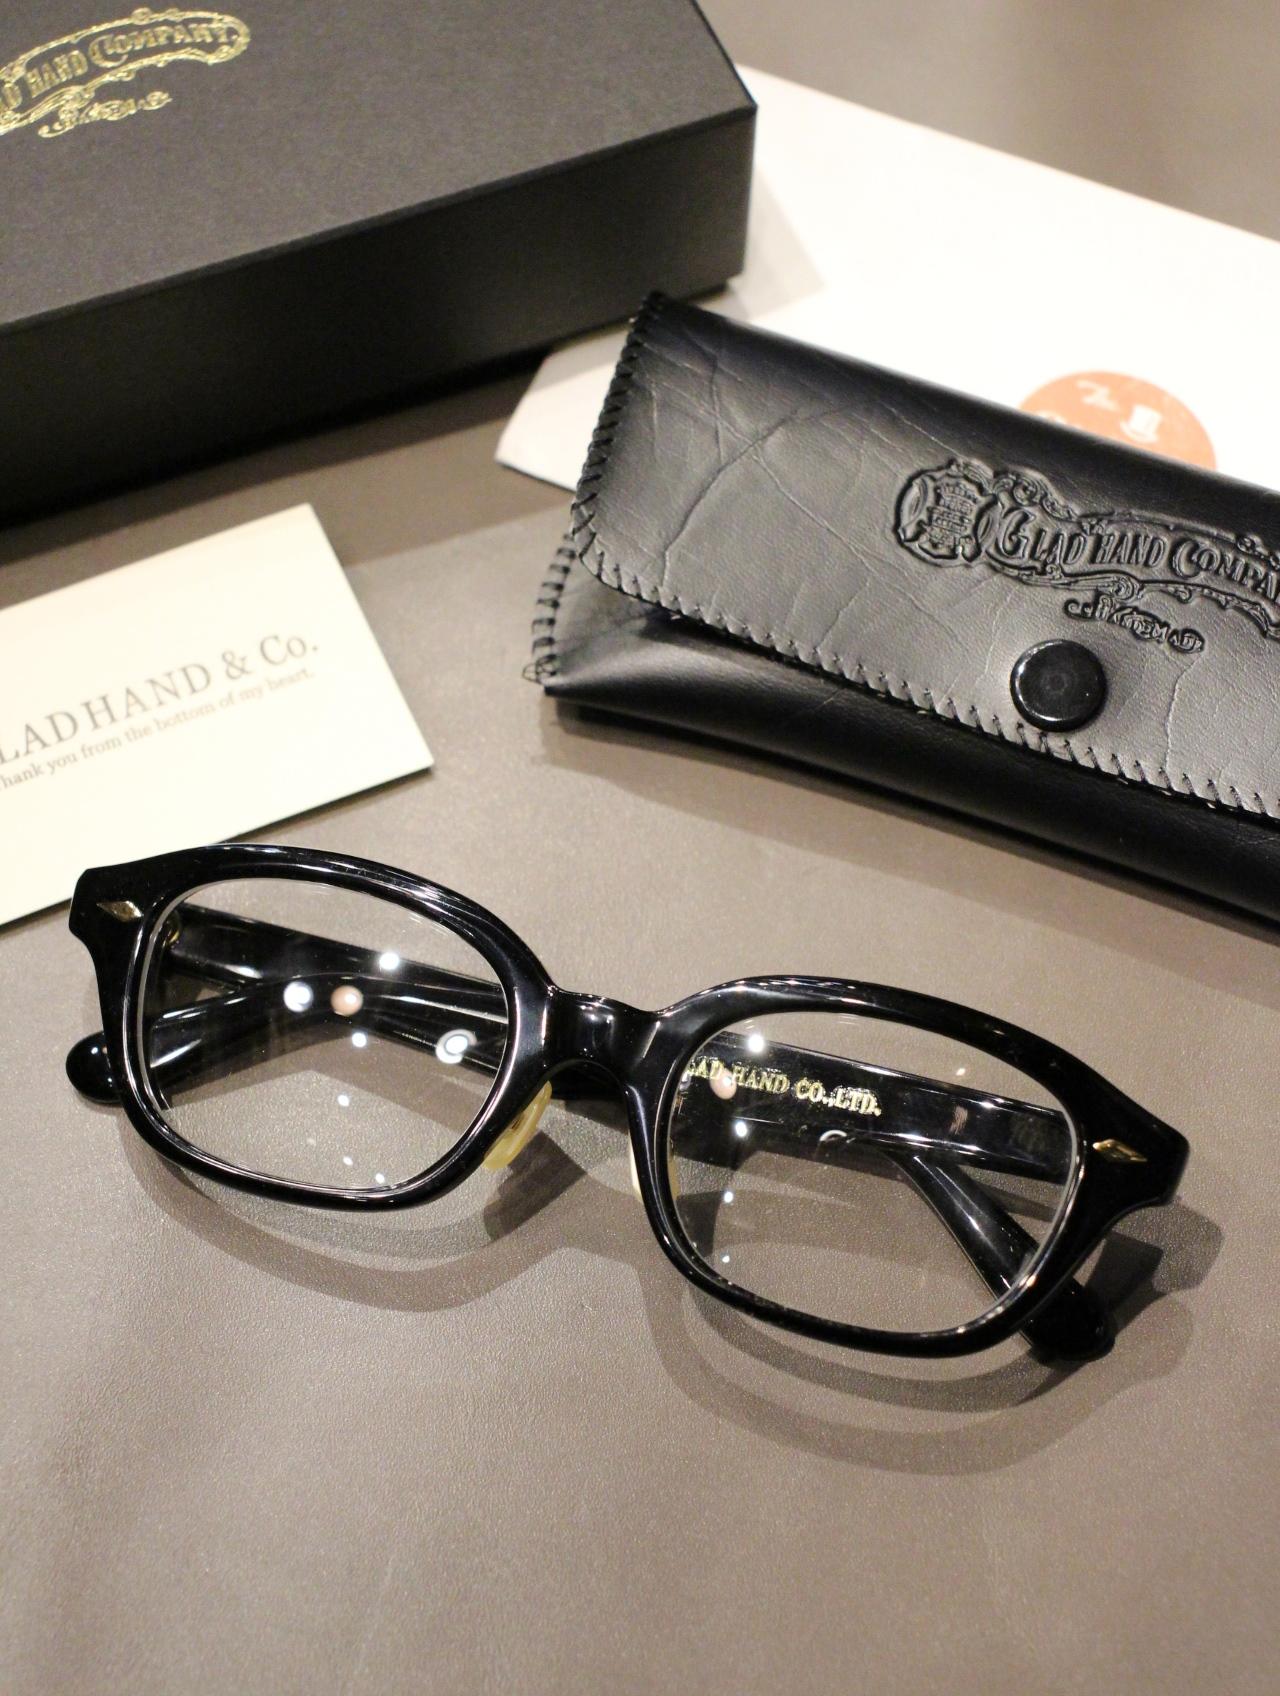 GLADHAND × 丹羽雅彦  「J-IMMY GLASSES ORNAMENT 〈BLACK / GOLD〉」  グラッシーズ